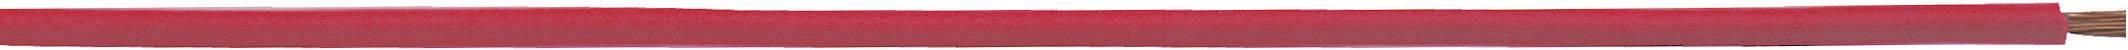 Opletenie / lanko LappKabel 4510033S H05V-K, 1 x 1 mm², vonkajší Ø 2.80 mm, 250 m, hnedá